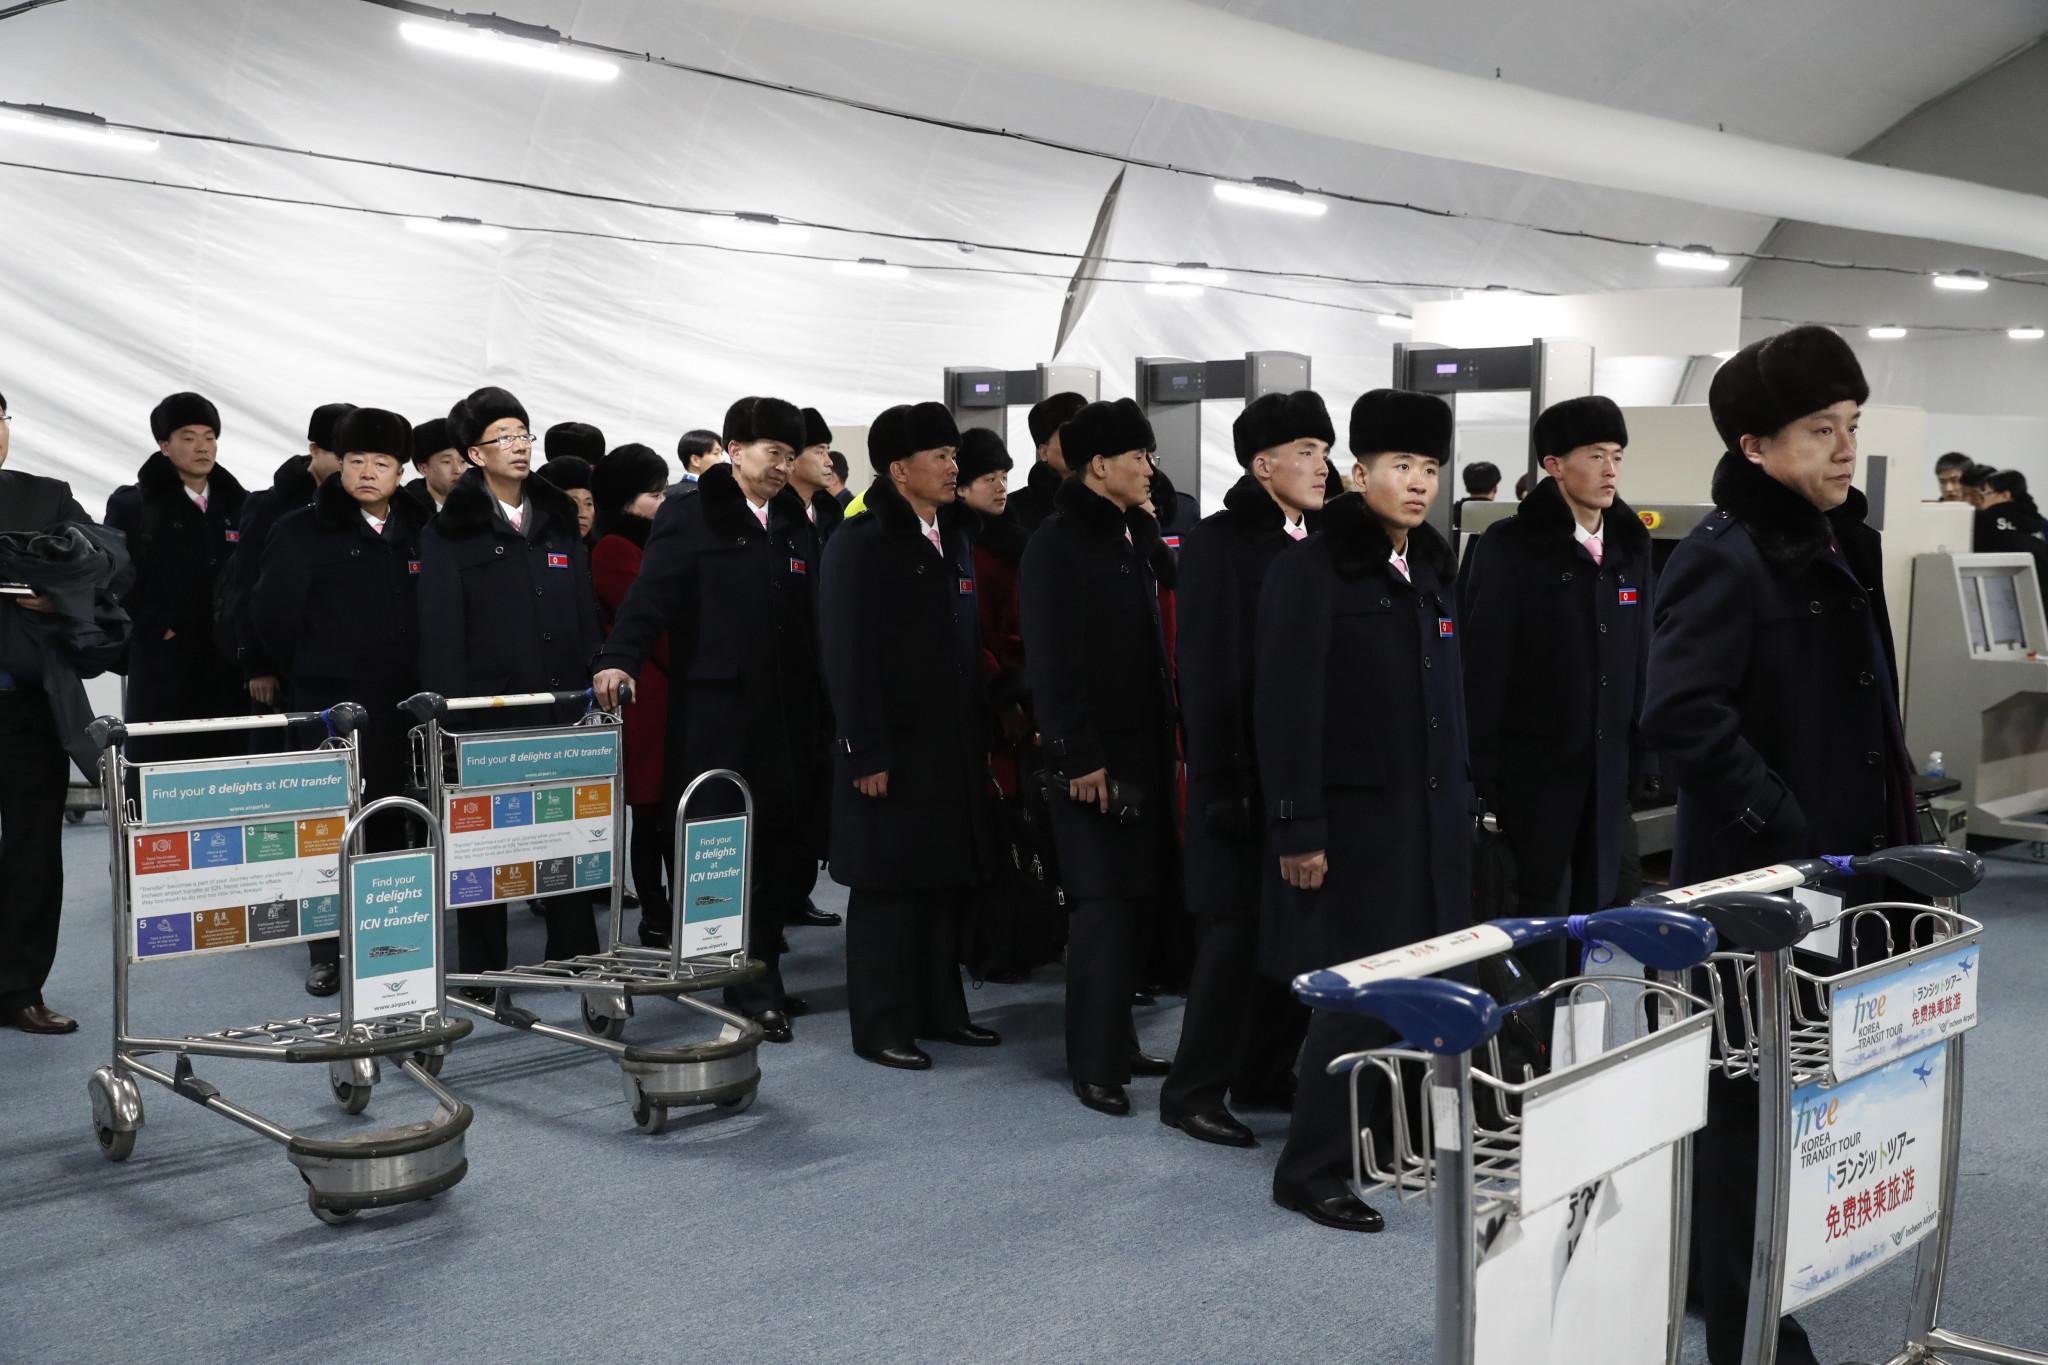 North Korean delegation arrives for historic Pyeongchang 2018 appearance